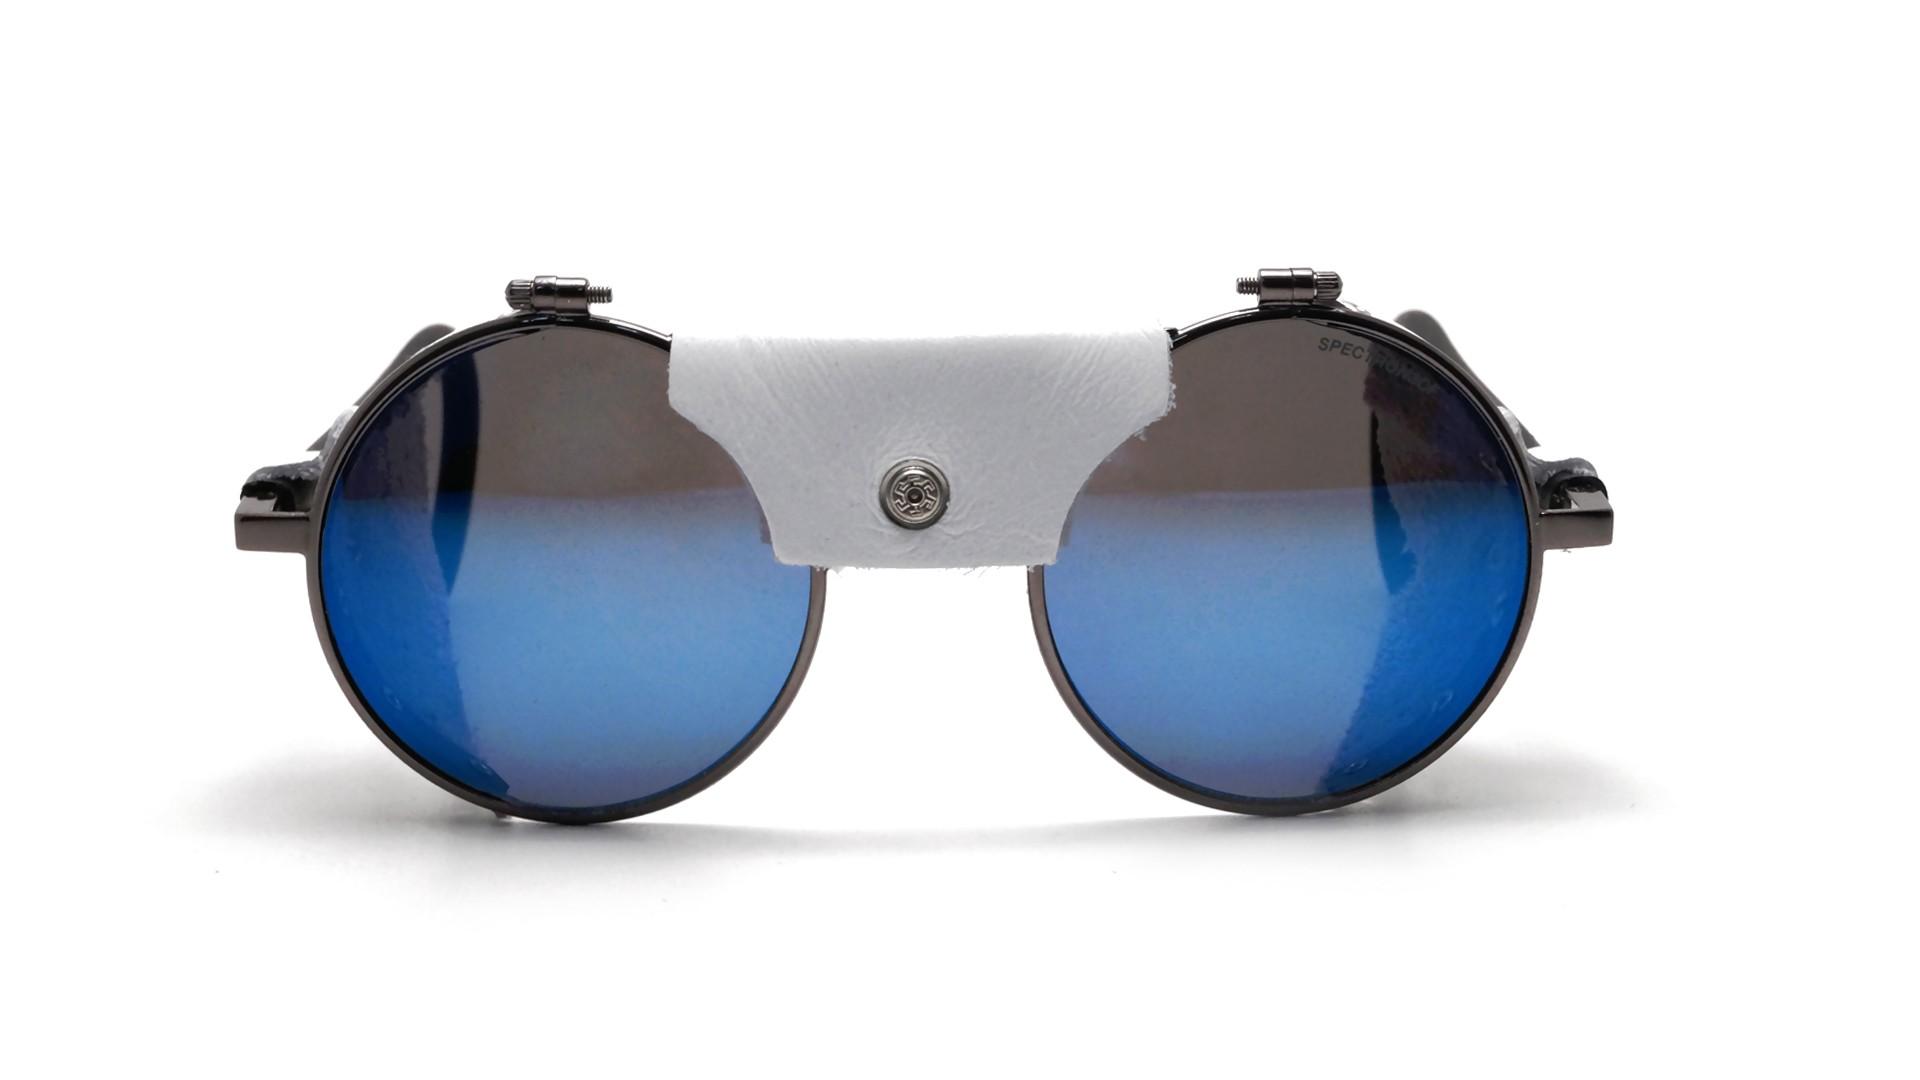 7b0667fc2b69a Sunglasses Julbo Vermont Classic Gun Silver J010 11 21 white leather shell  Blue Lenses 51-23 Medium Flash